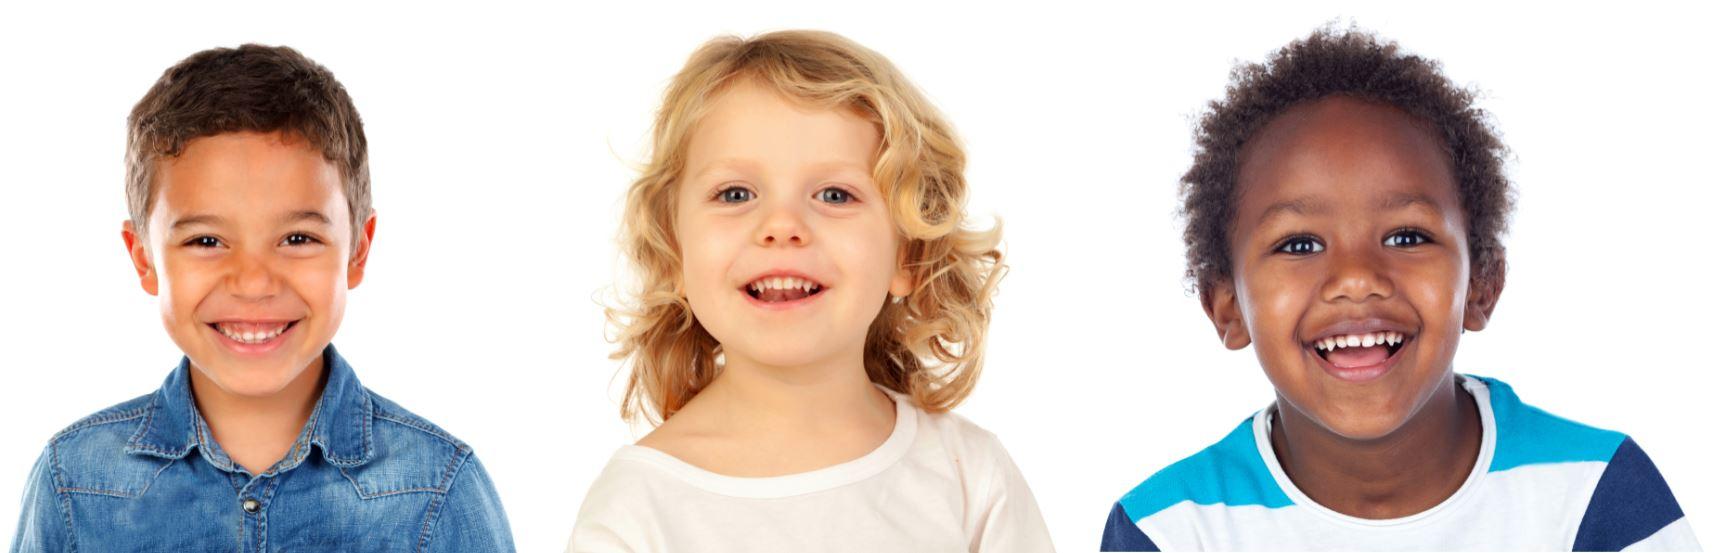 Adopted children are descendants